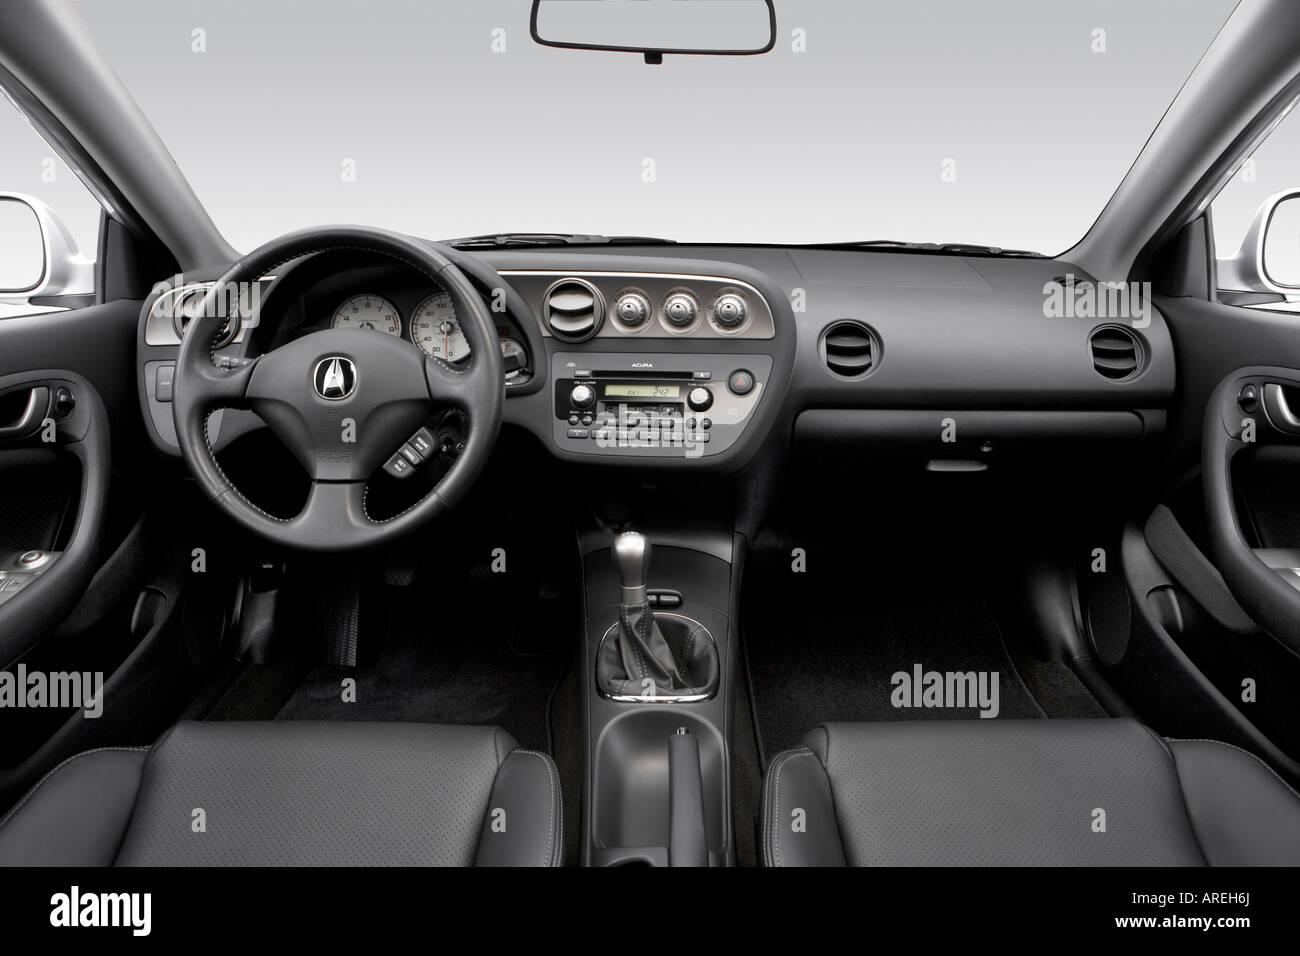 2006 acura rsx type s in silver dashboard center console gear